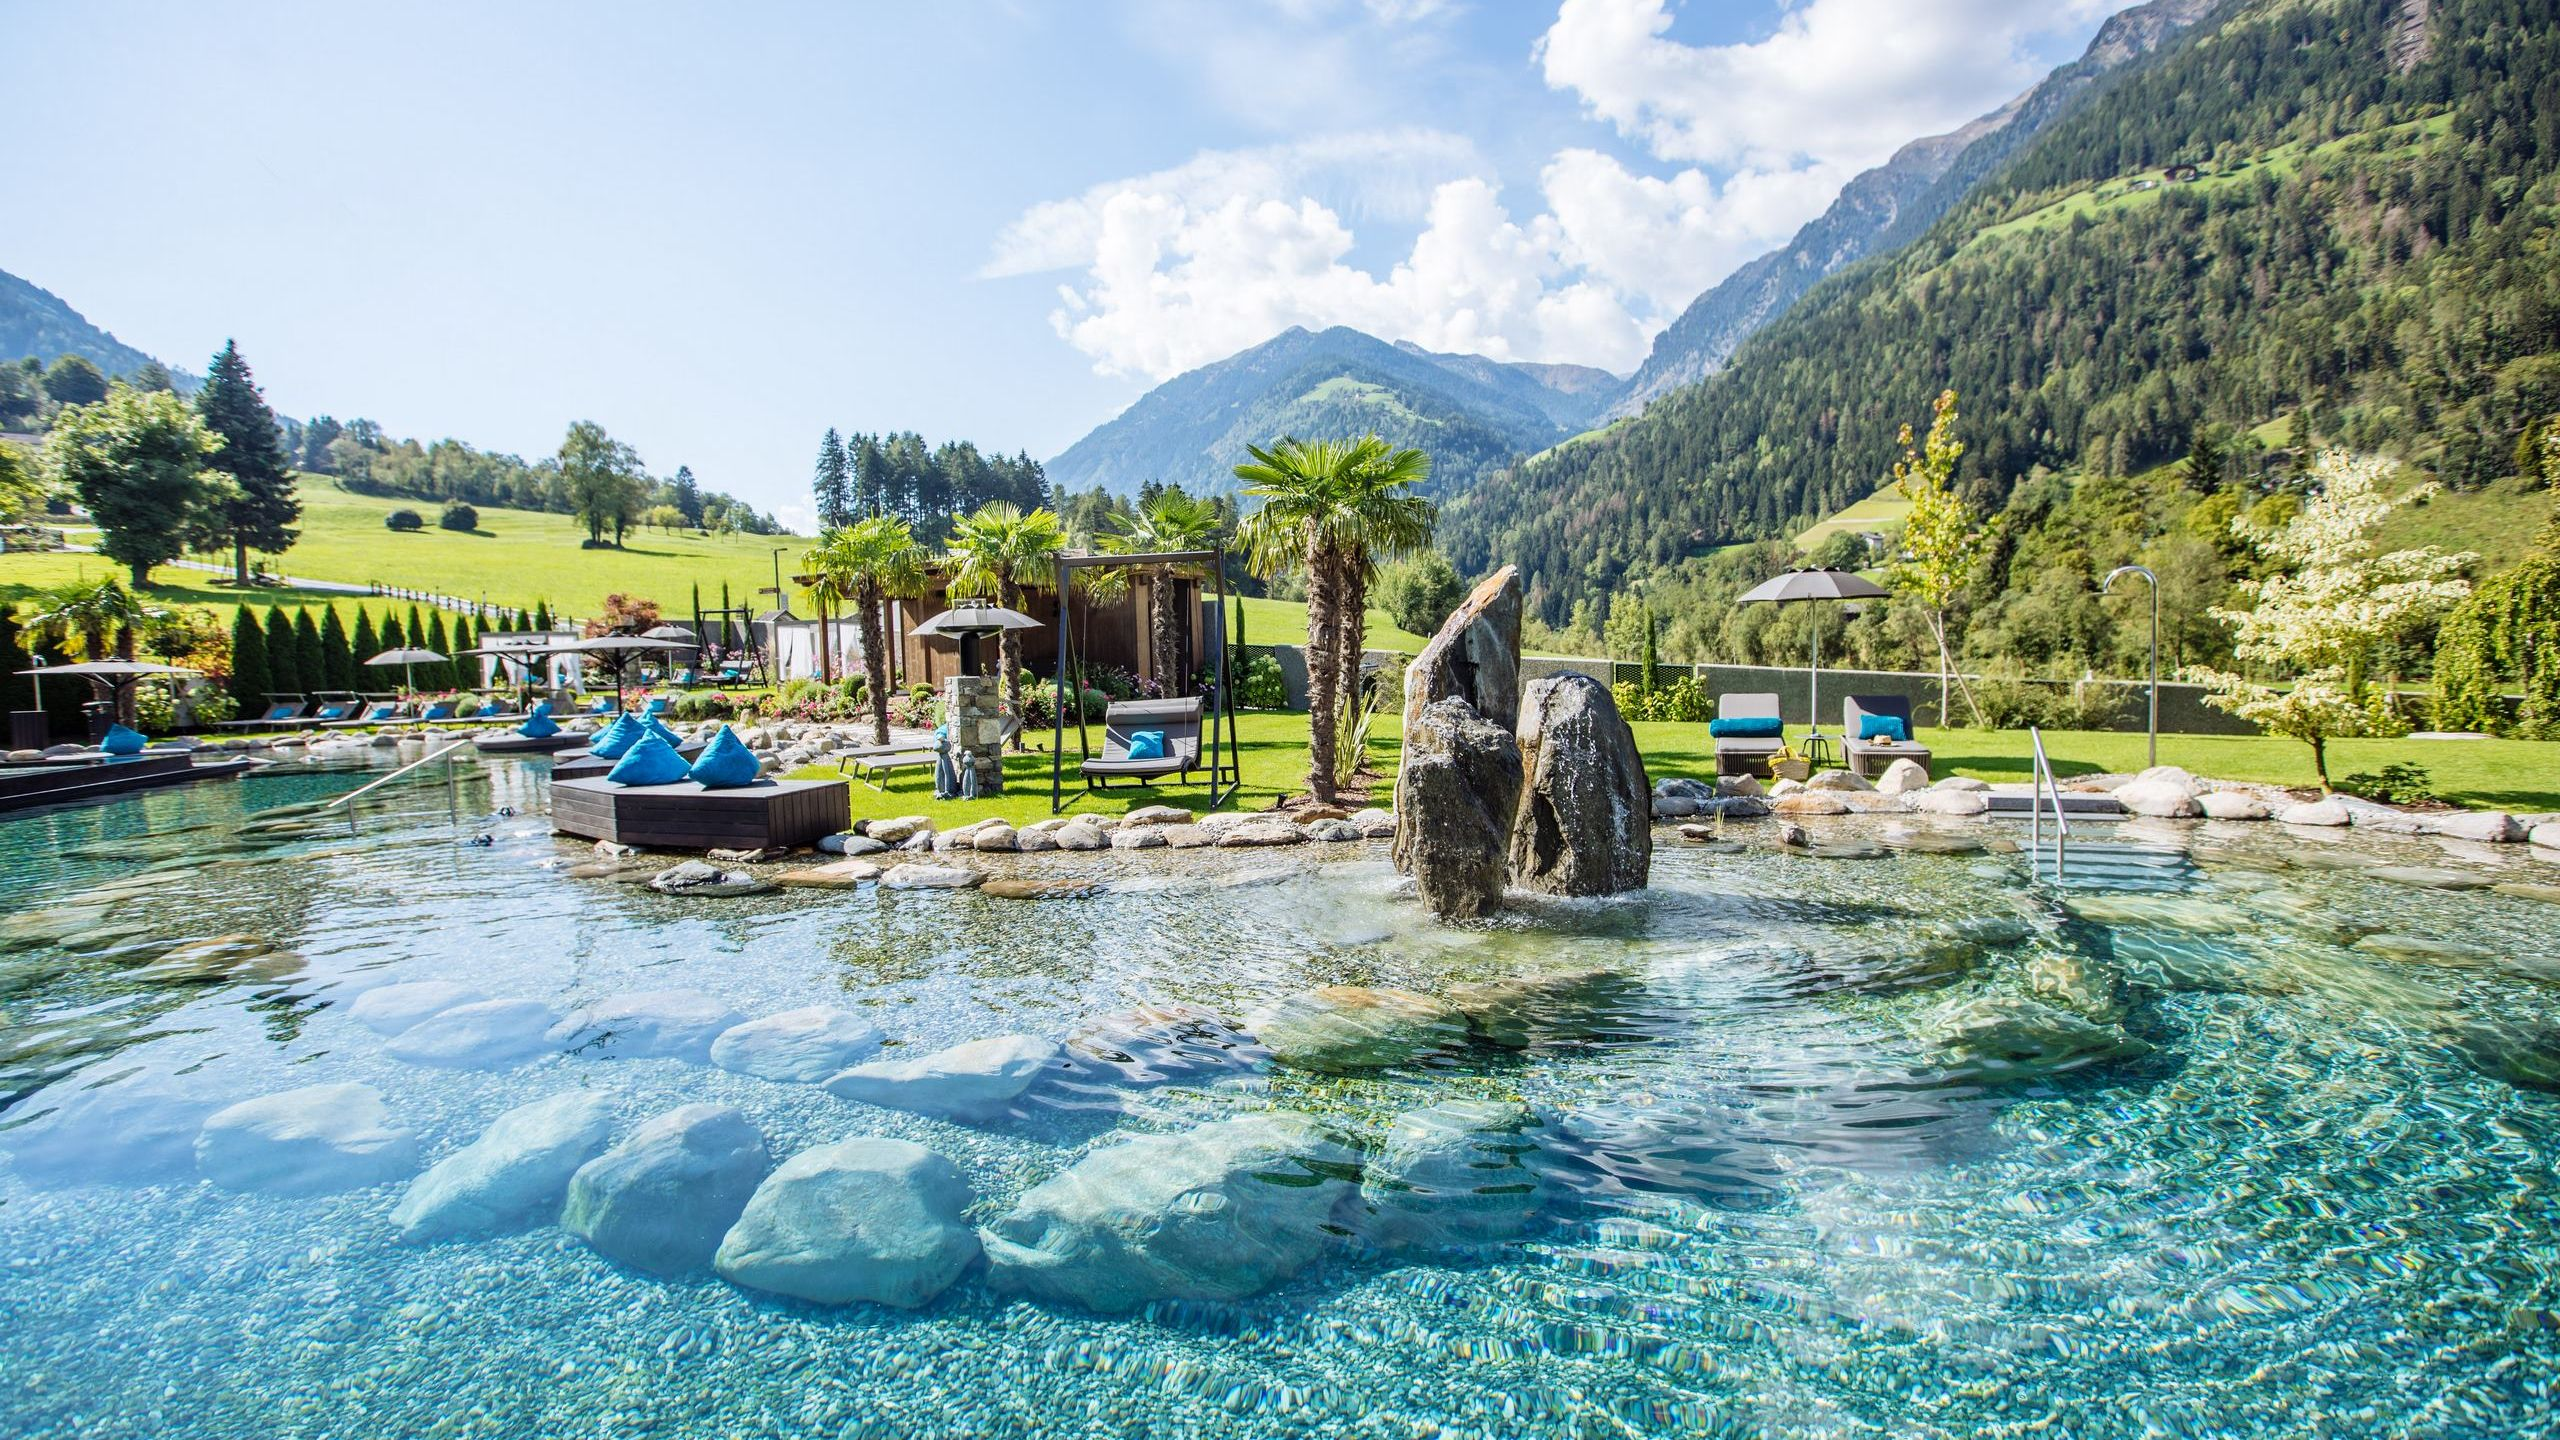 Unsere wellnesshotels s dtirol die andreus resorts spa for Design wellnesshotel sudtirol